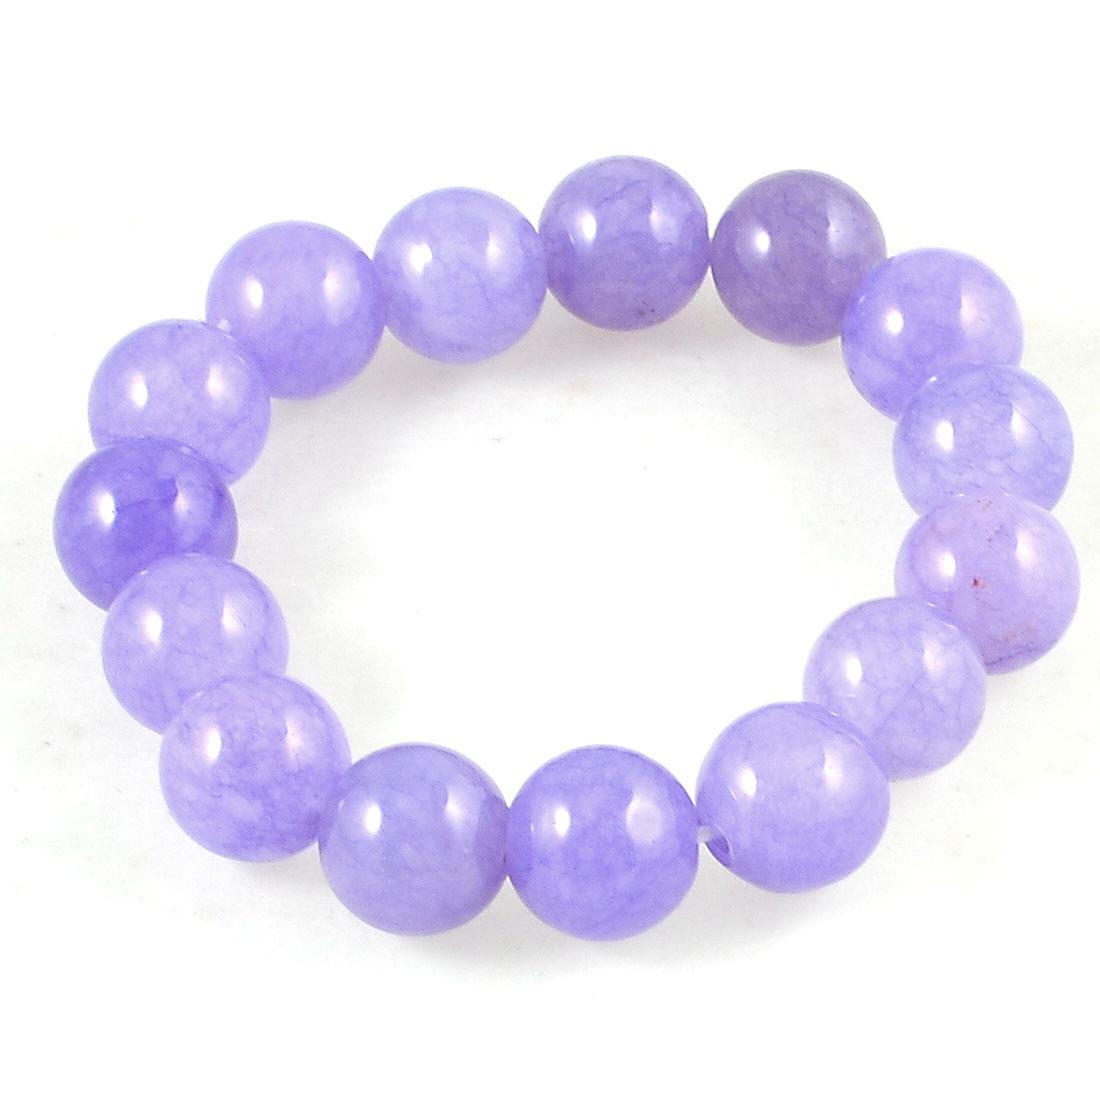 Lady Men Synthetic Gem Stone Purple 13mm Dia Round Beaded Stretch Bracelet Wrist Bangle